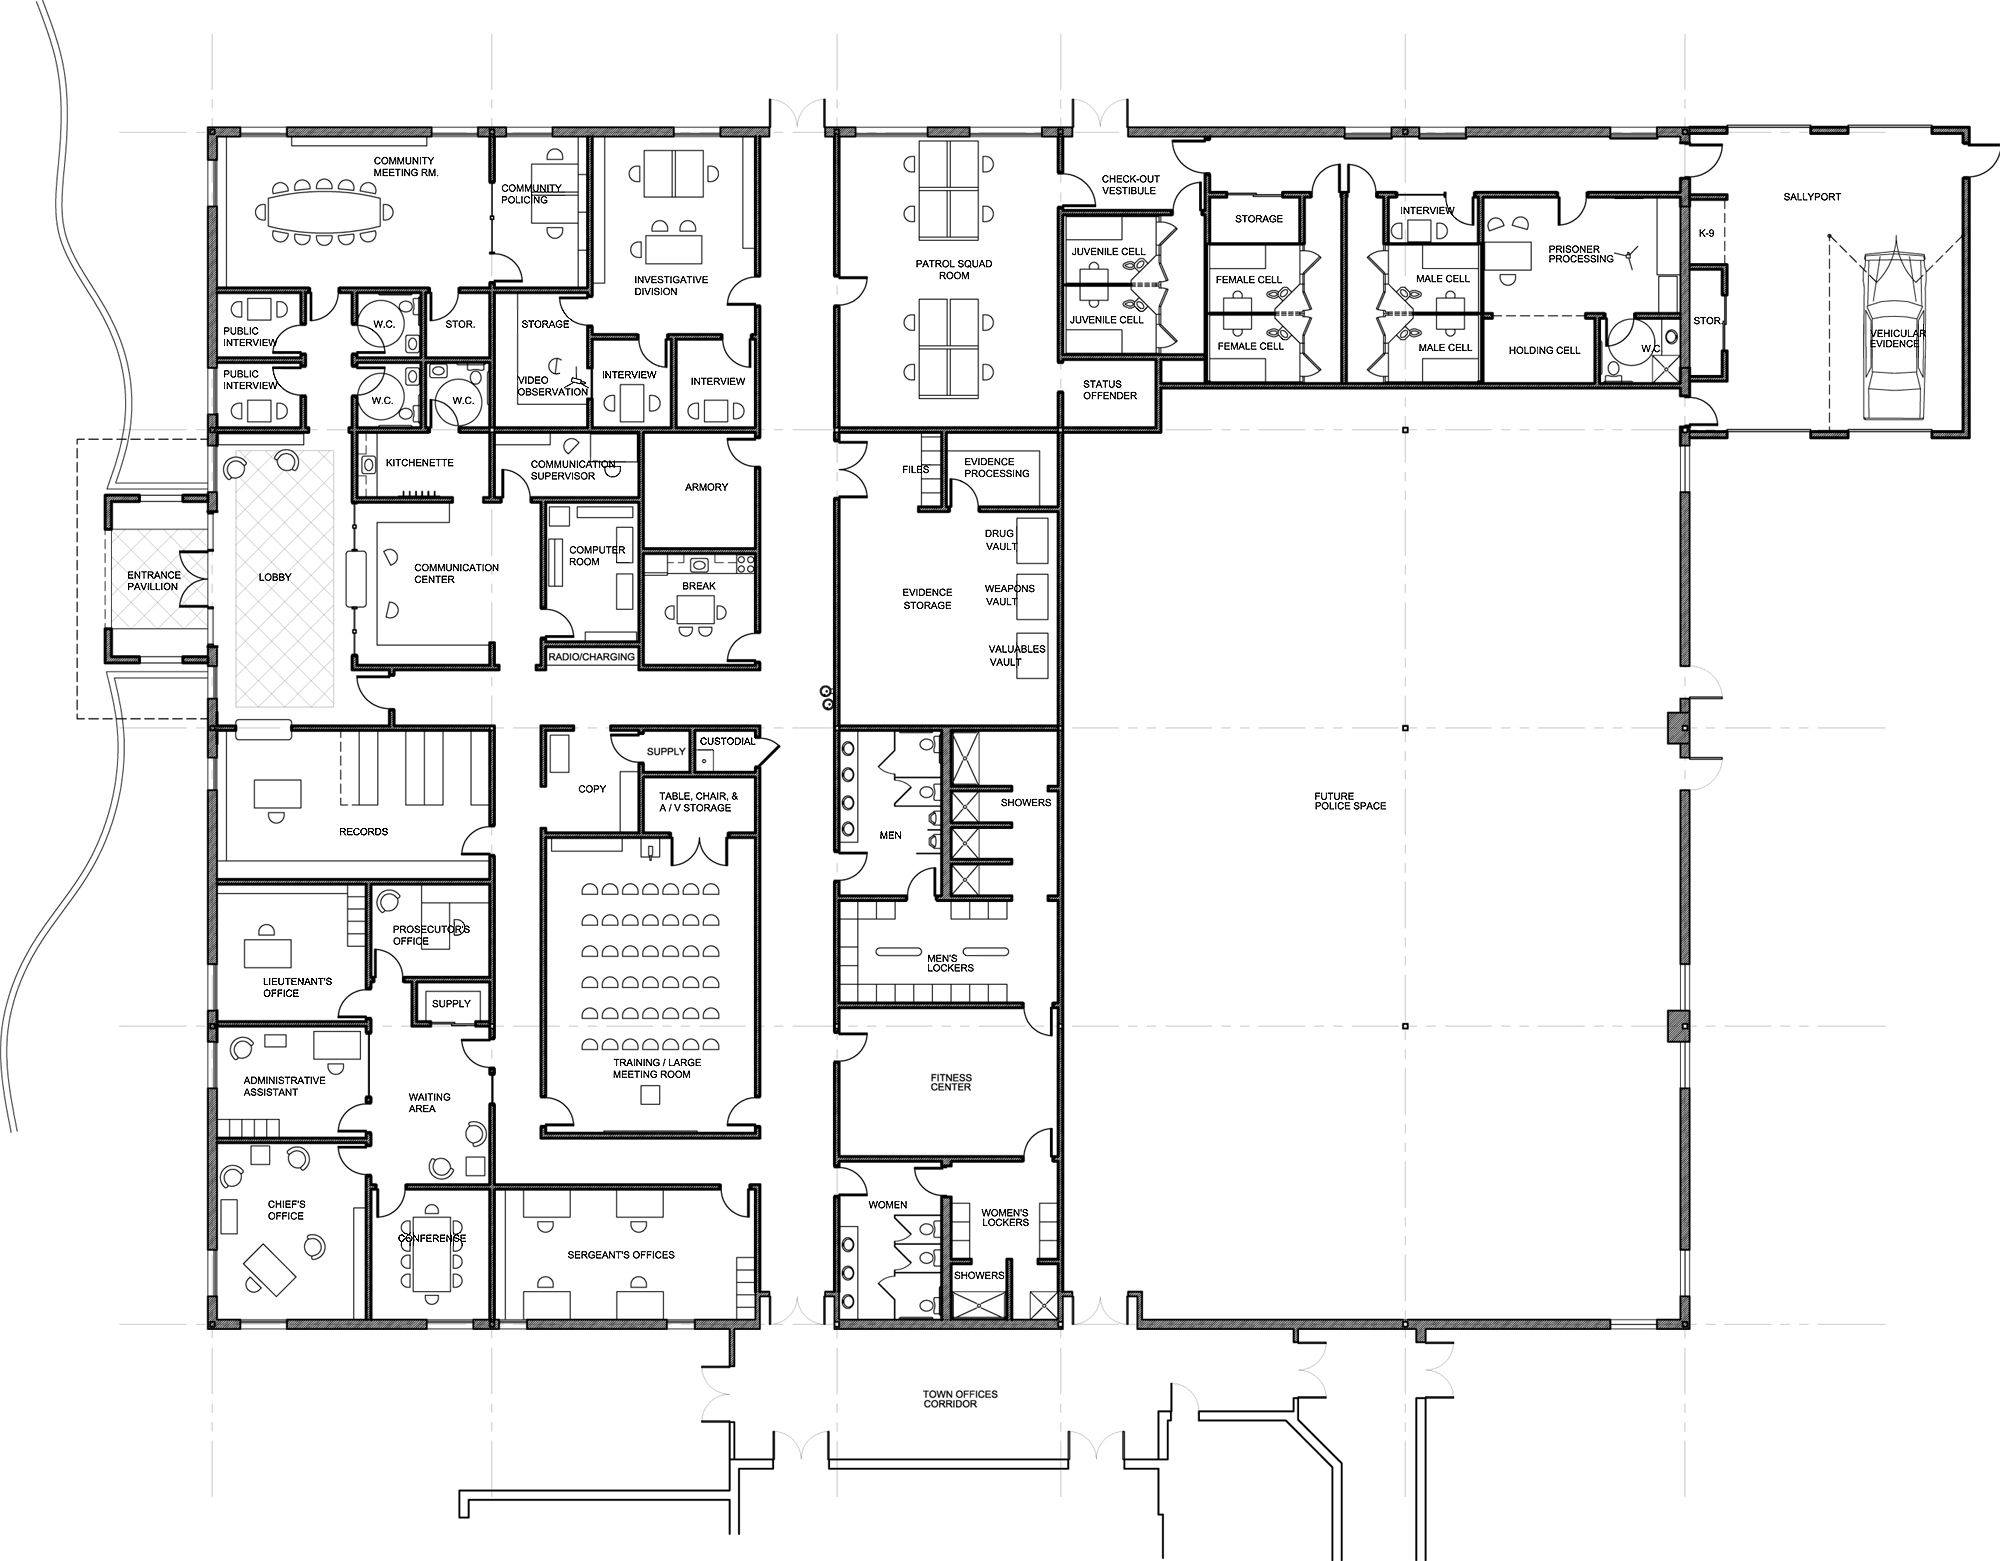 Astonishing floor plans blueprints on floor with home floor plan astonishing floor plans blueprints on floor with home floor plan pelham police station plans malvernweather Gallery